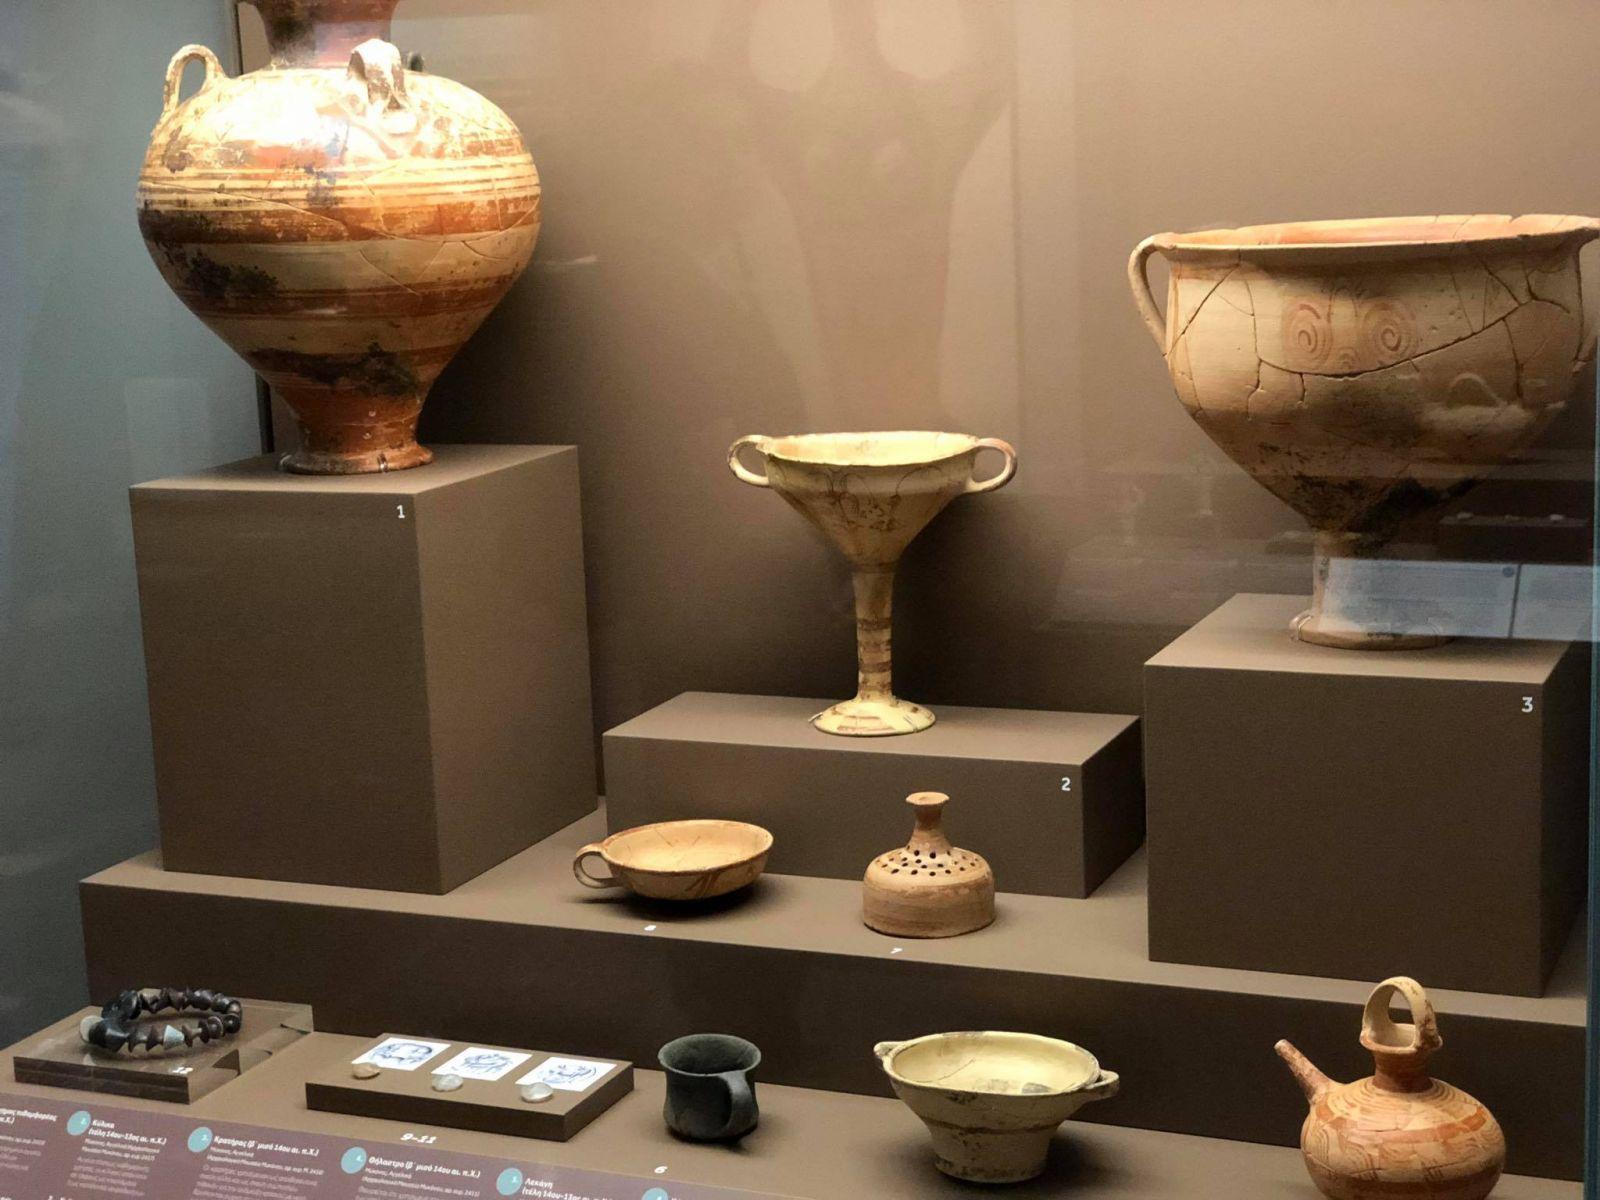 H μυκηναϊκή Μυκόνος στην έκθεση «Από τον κόσμο του Ομήρου. Τήνος και Κυκλάδες στη Μυκηναϊκή εποχή»